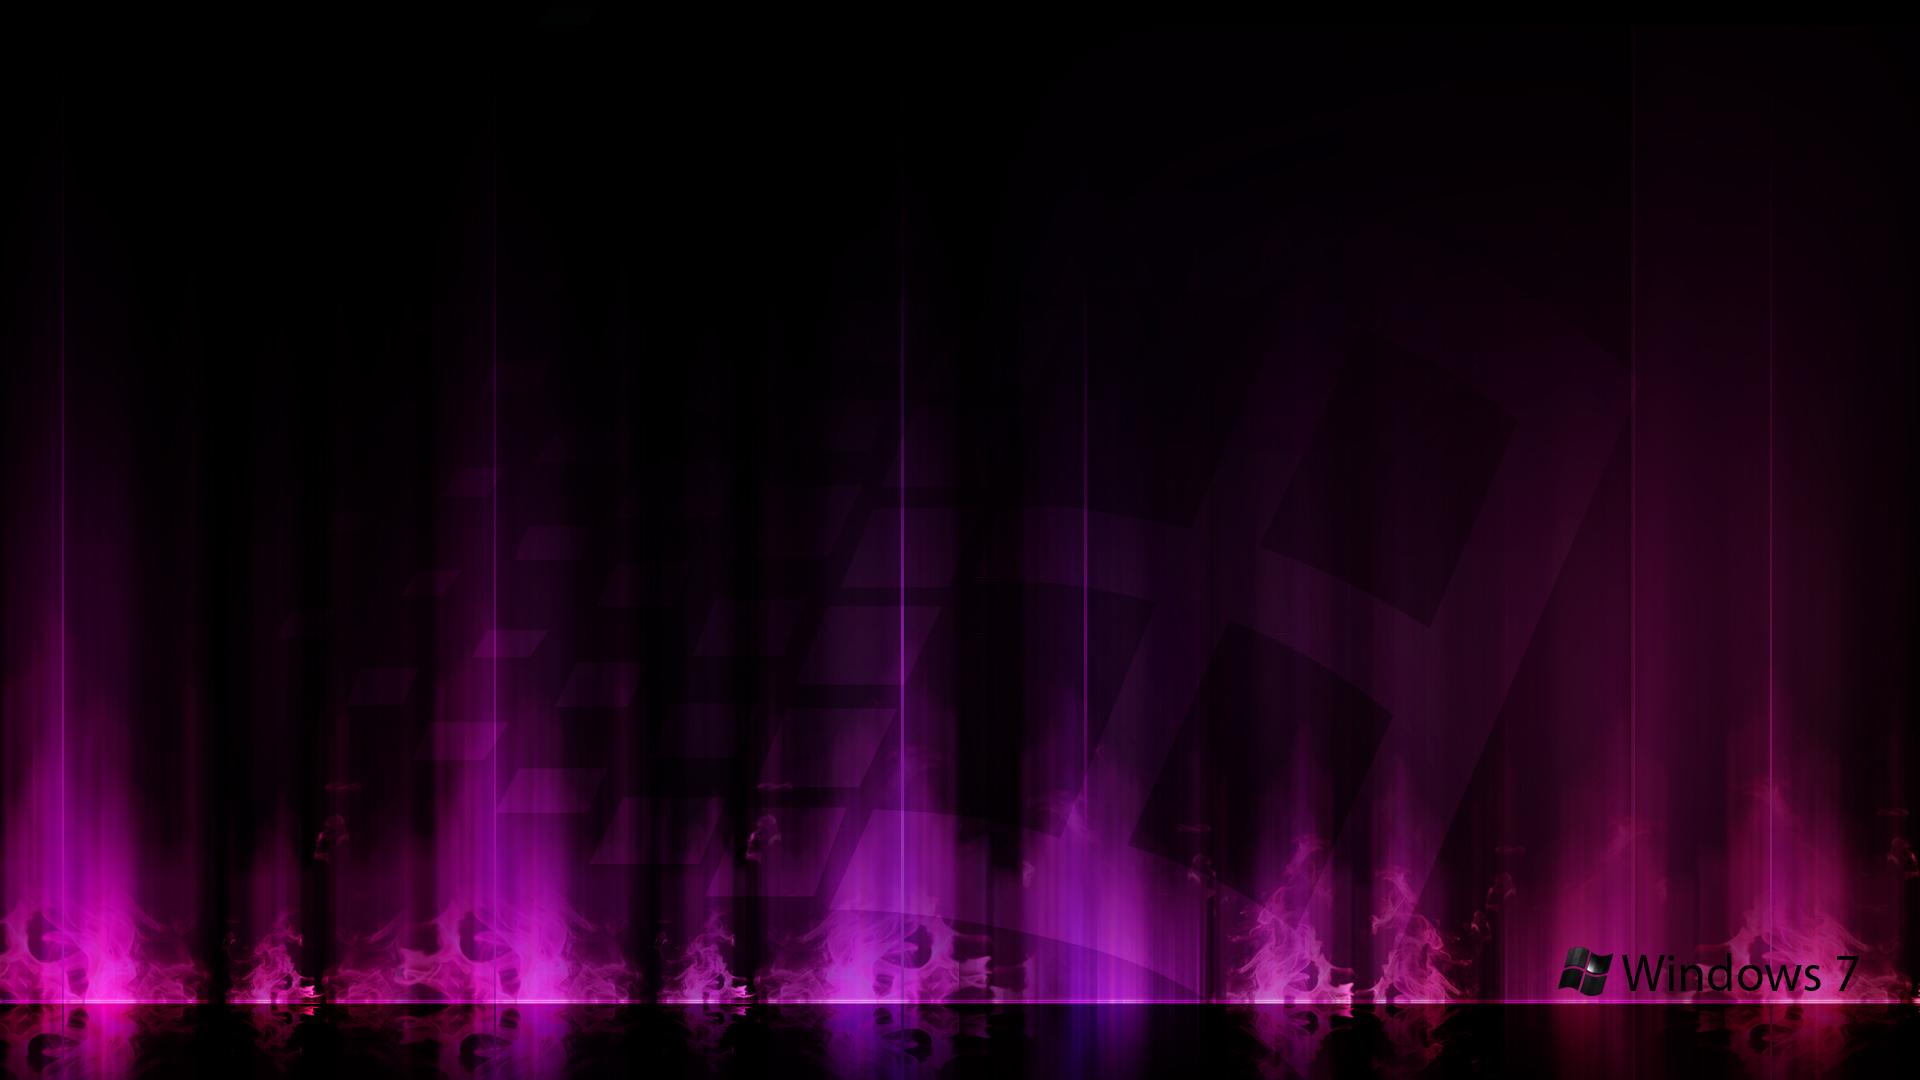 Purple Hd wallpaper   131135 1920x1080